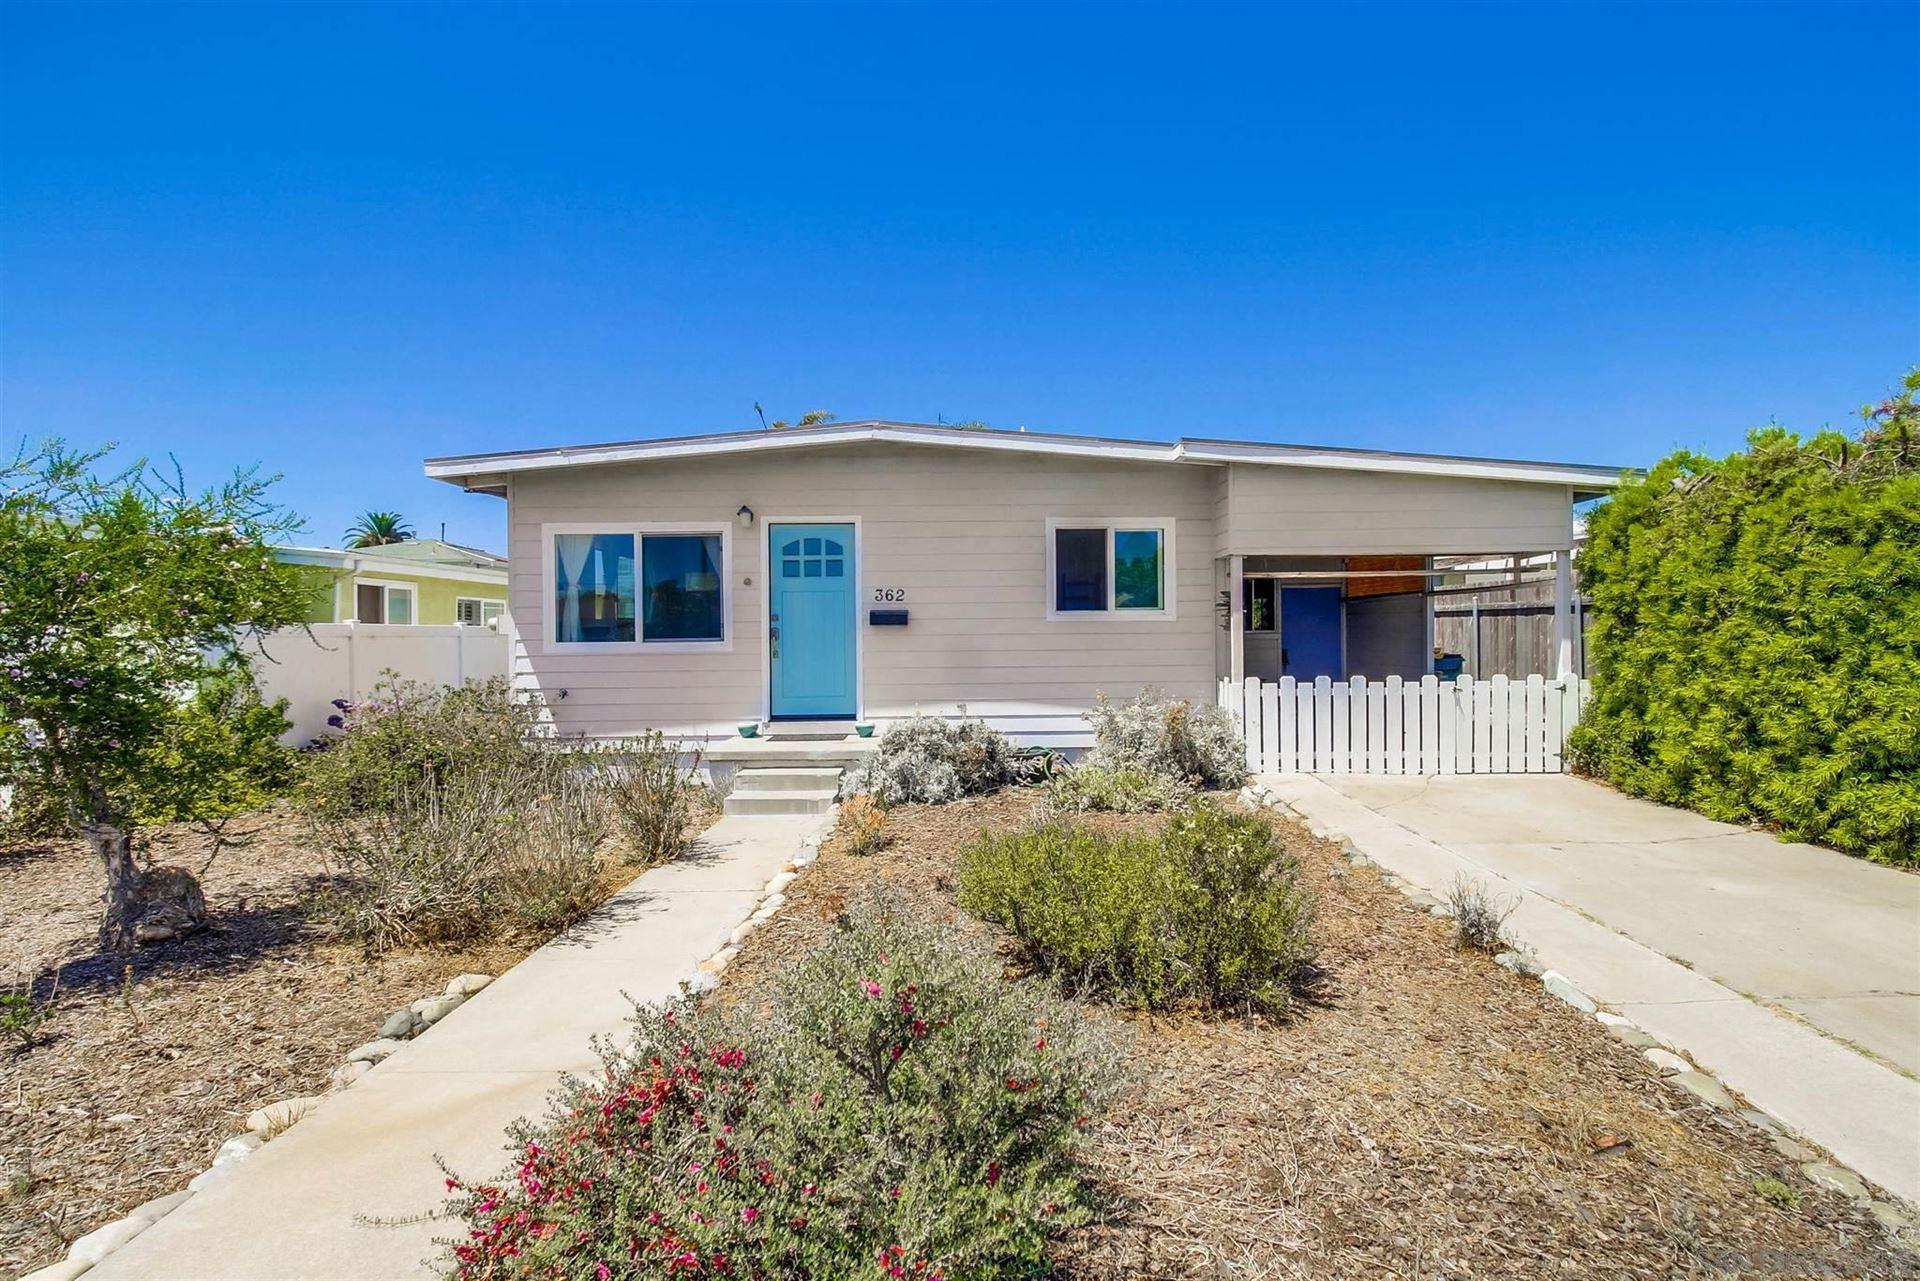 Photo of 362 Elm Ave, Imperial Beach, CA 91932 (MLS # 210021541)